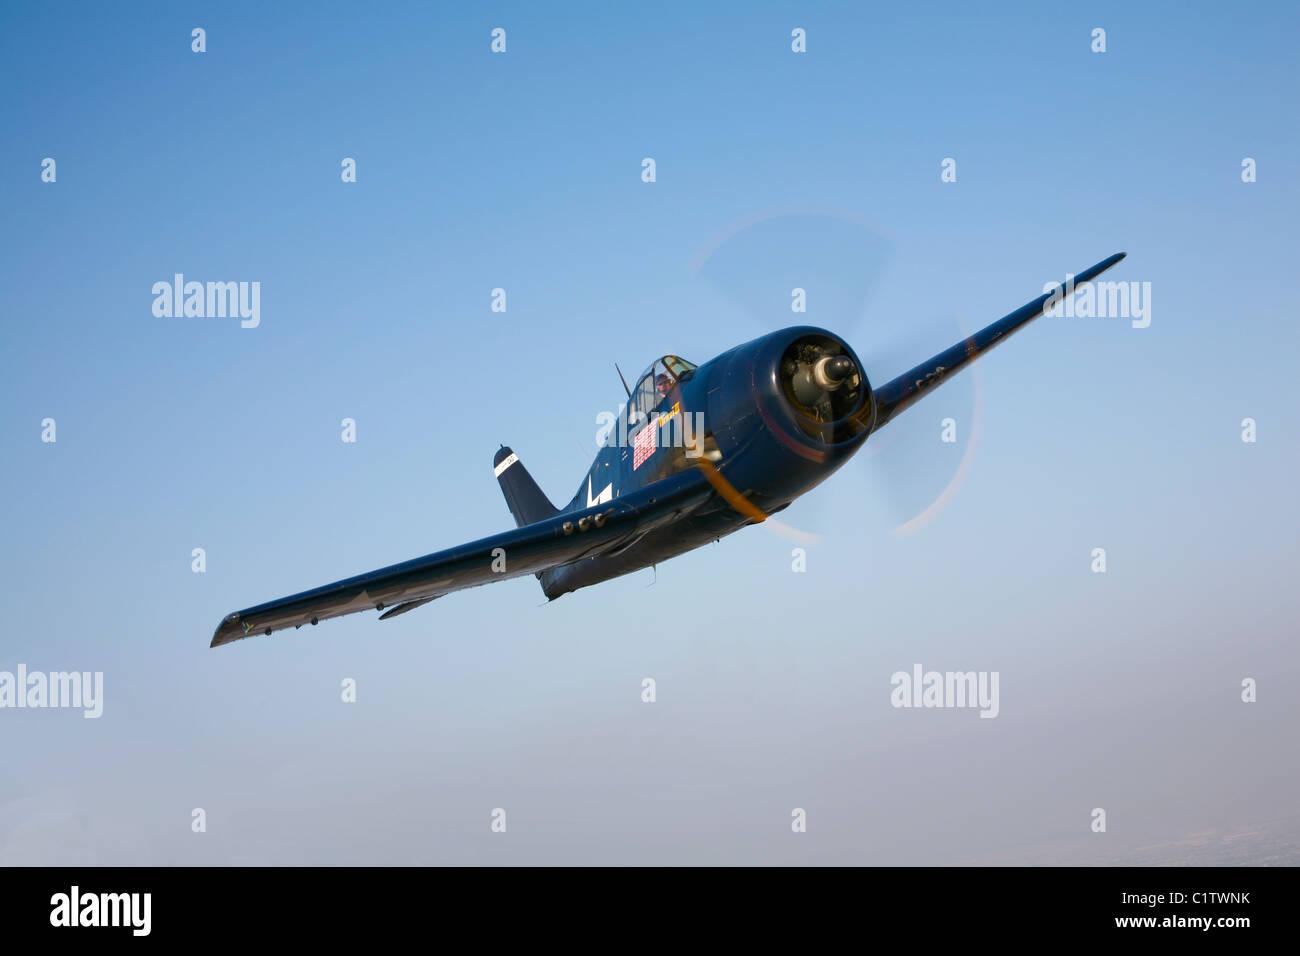 The Commemorative Air Force's F6F-5 Hellcat in flight near Chino, California. - Stock Image